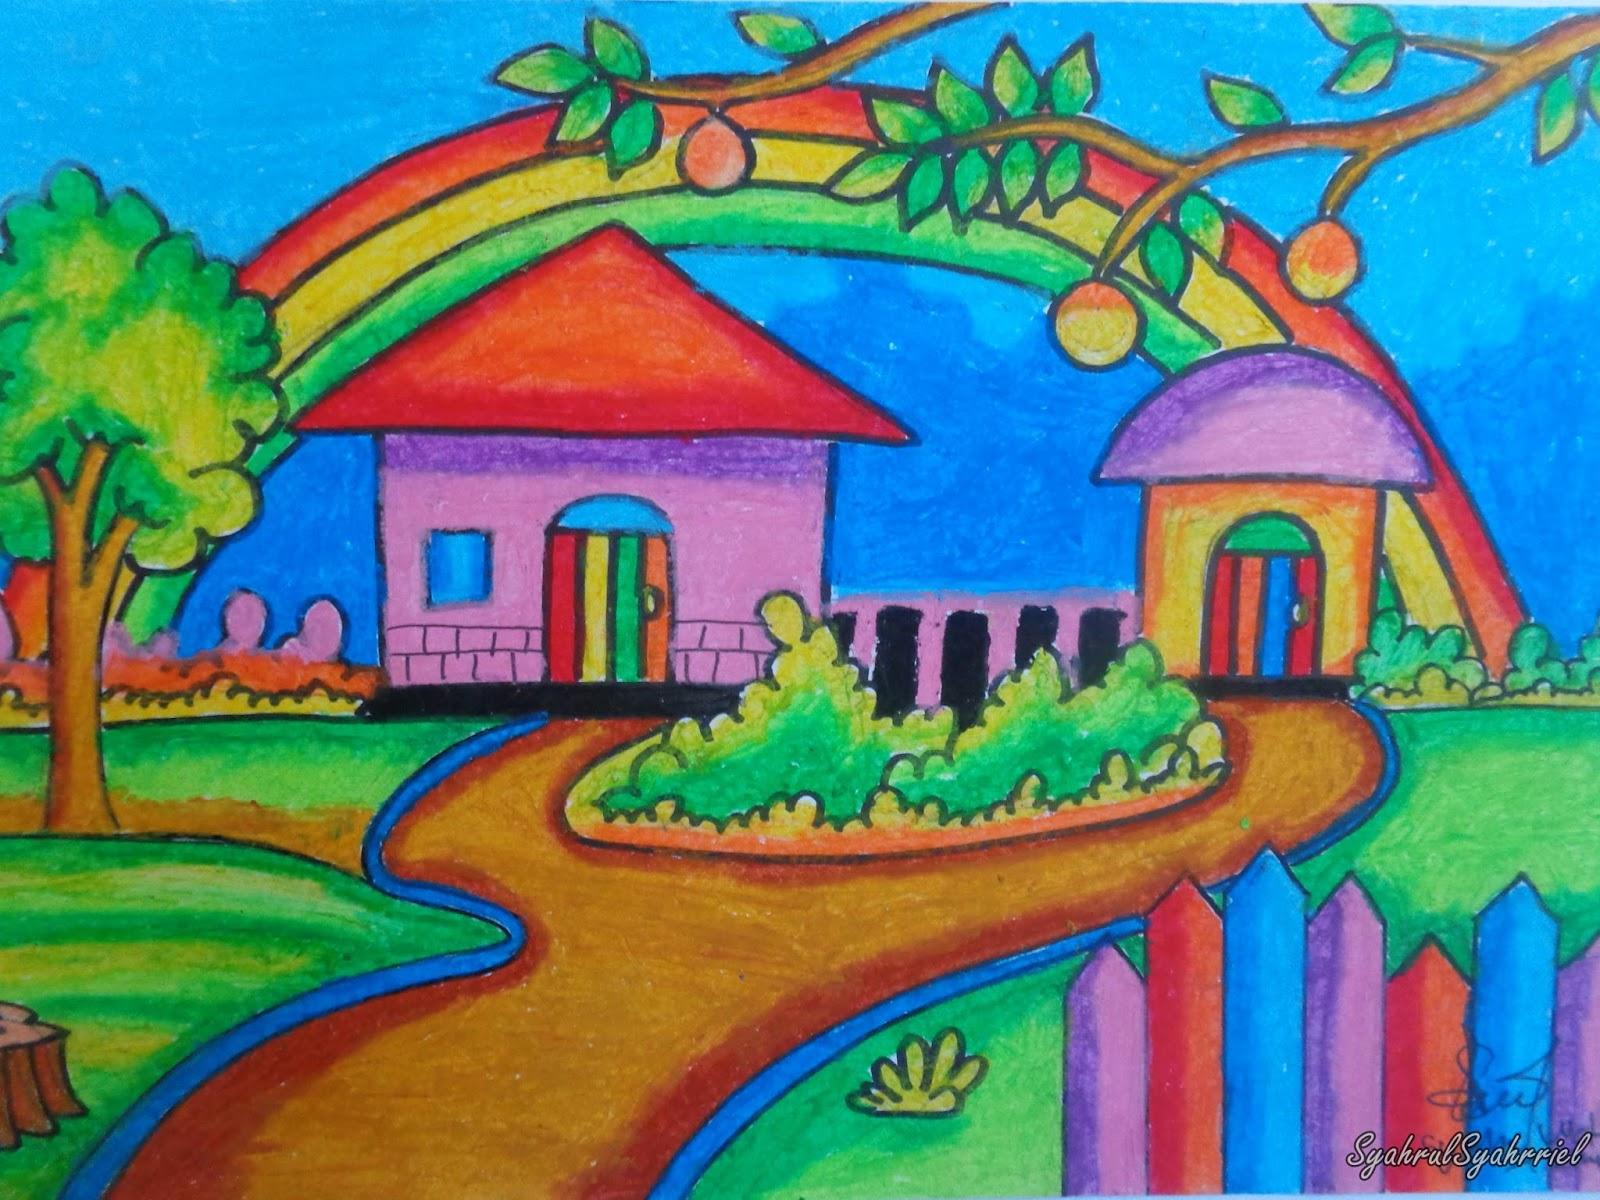 Gambar Ilustrasi Pemandangan Crayon